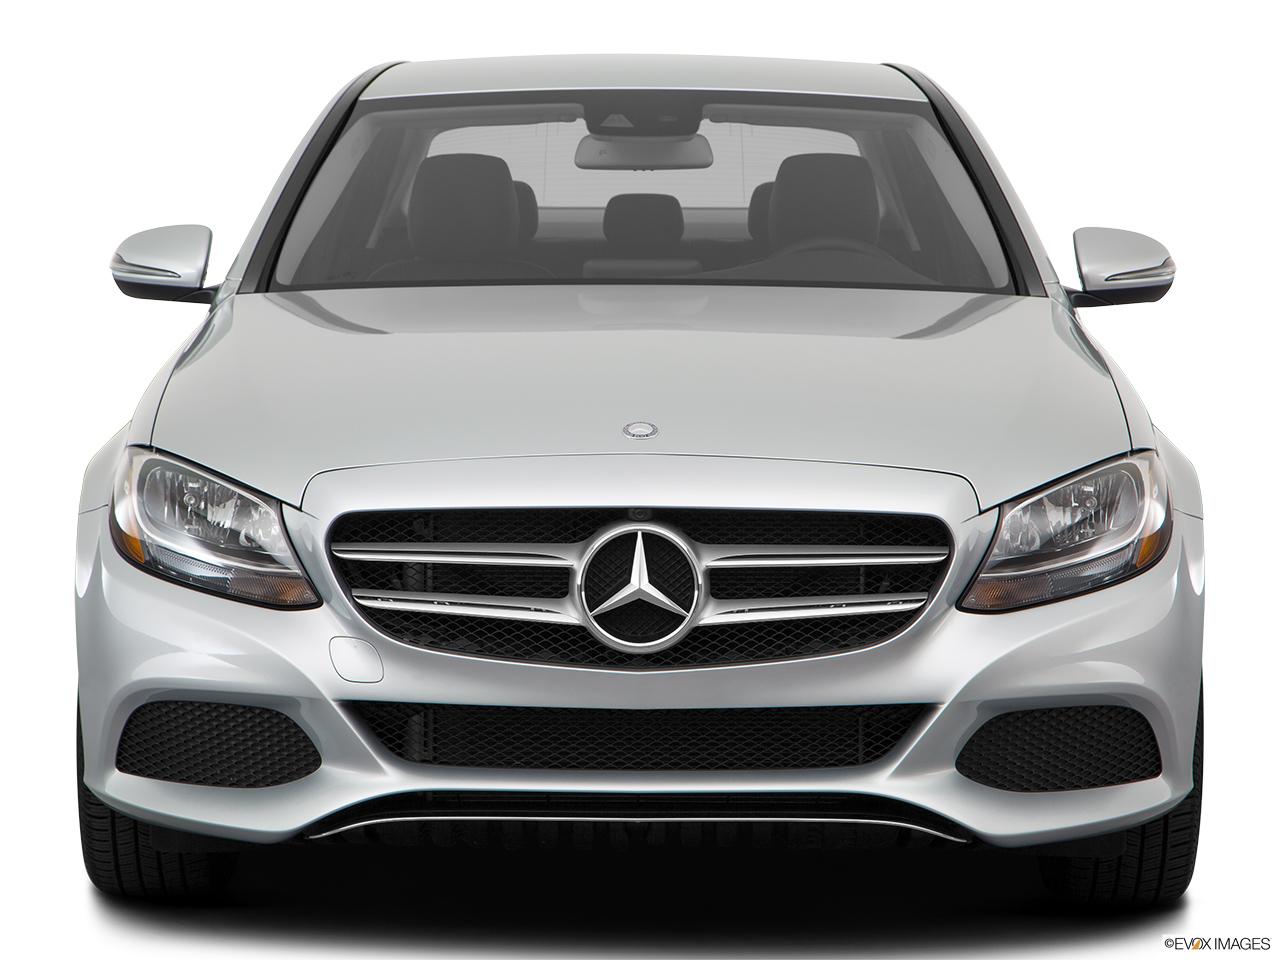 mercedes benz c class 2017 c 180 in uae new car prices. Black Bedroom Furniture Sets. Home Design Ideas